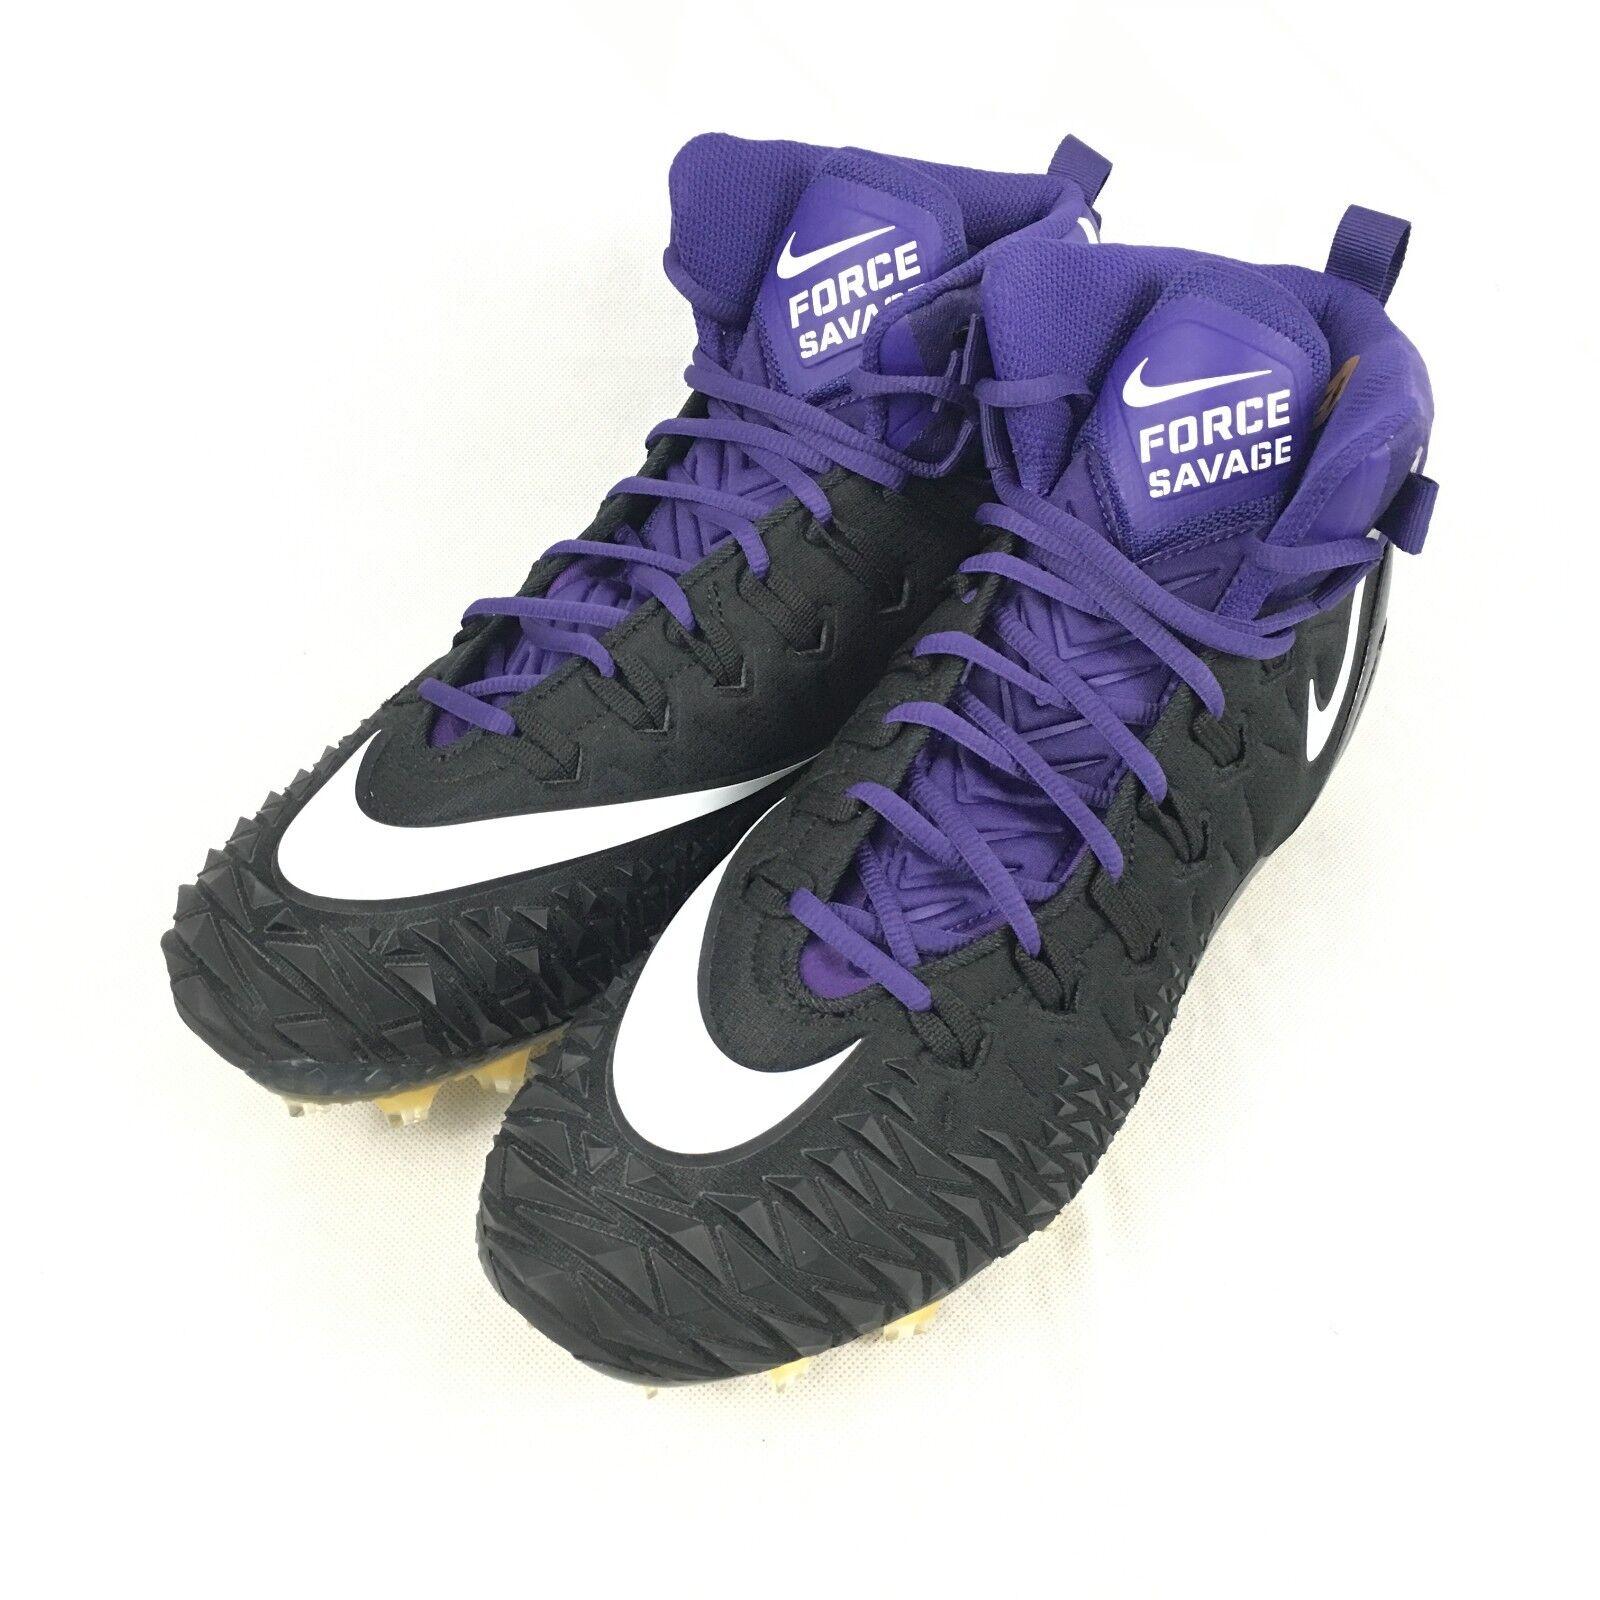 Nike Force Savage Pro TD Uomo Football Cleats Size 12 Purple Nero 918346-015